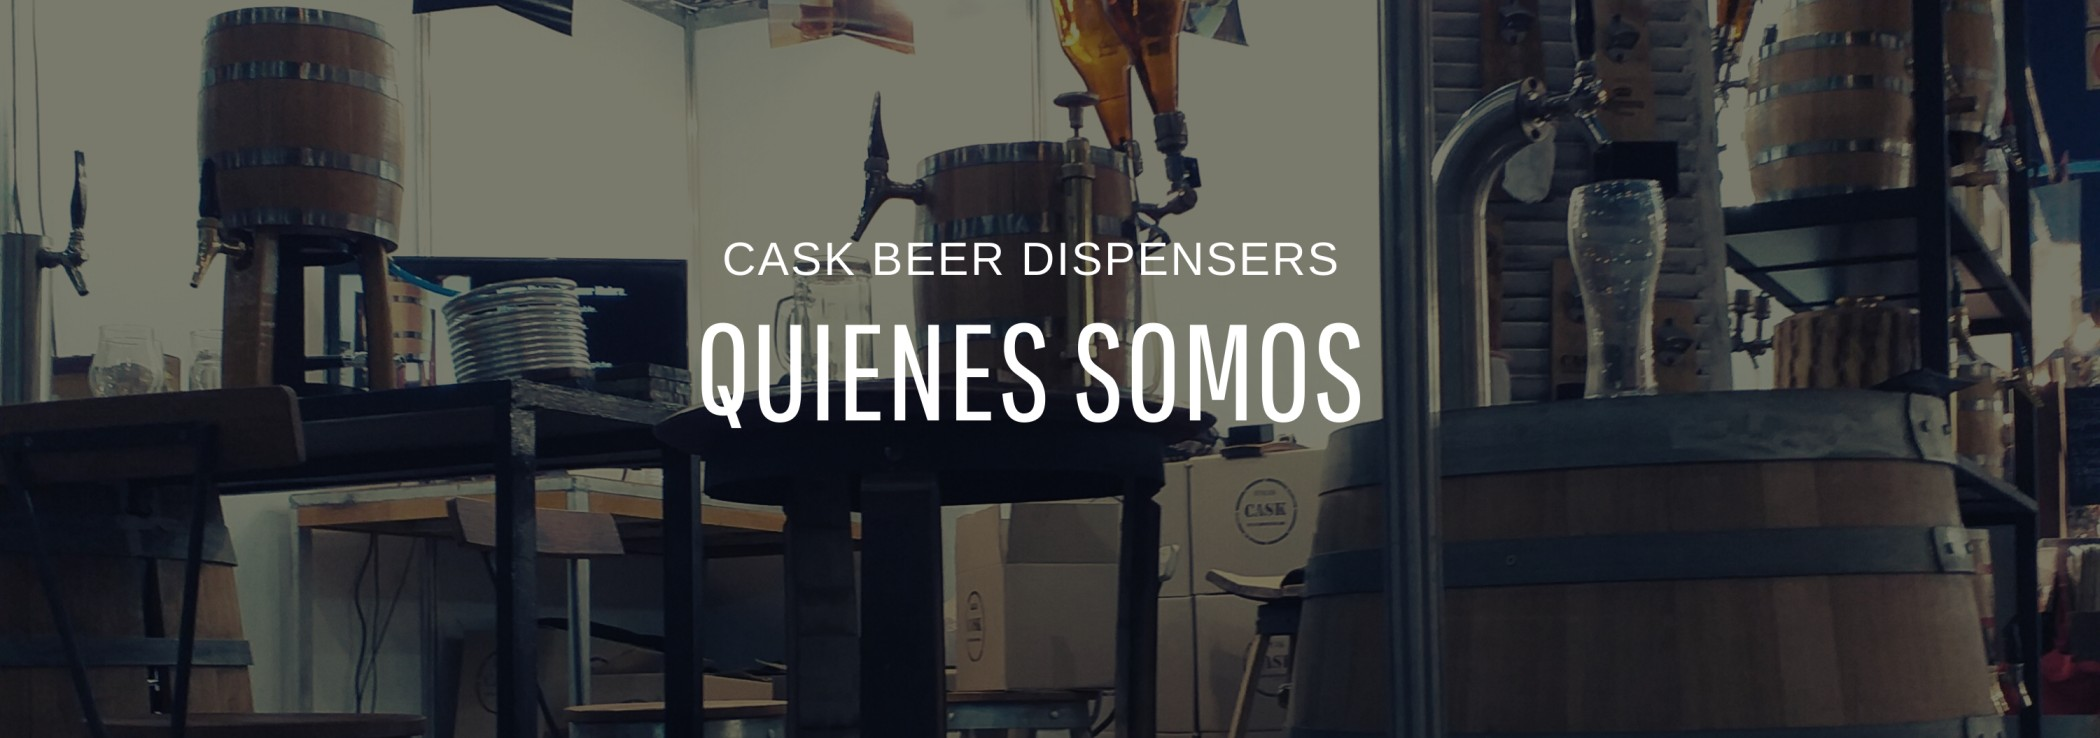 cask beer dispernsers